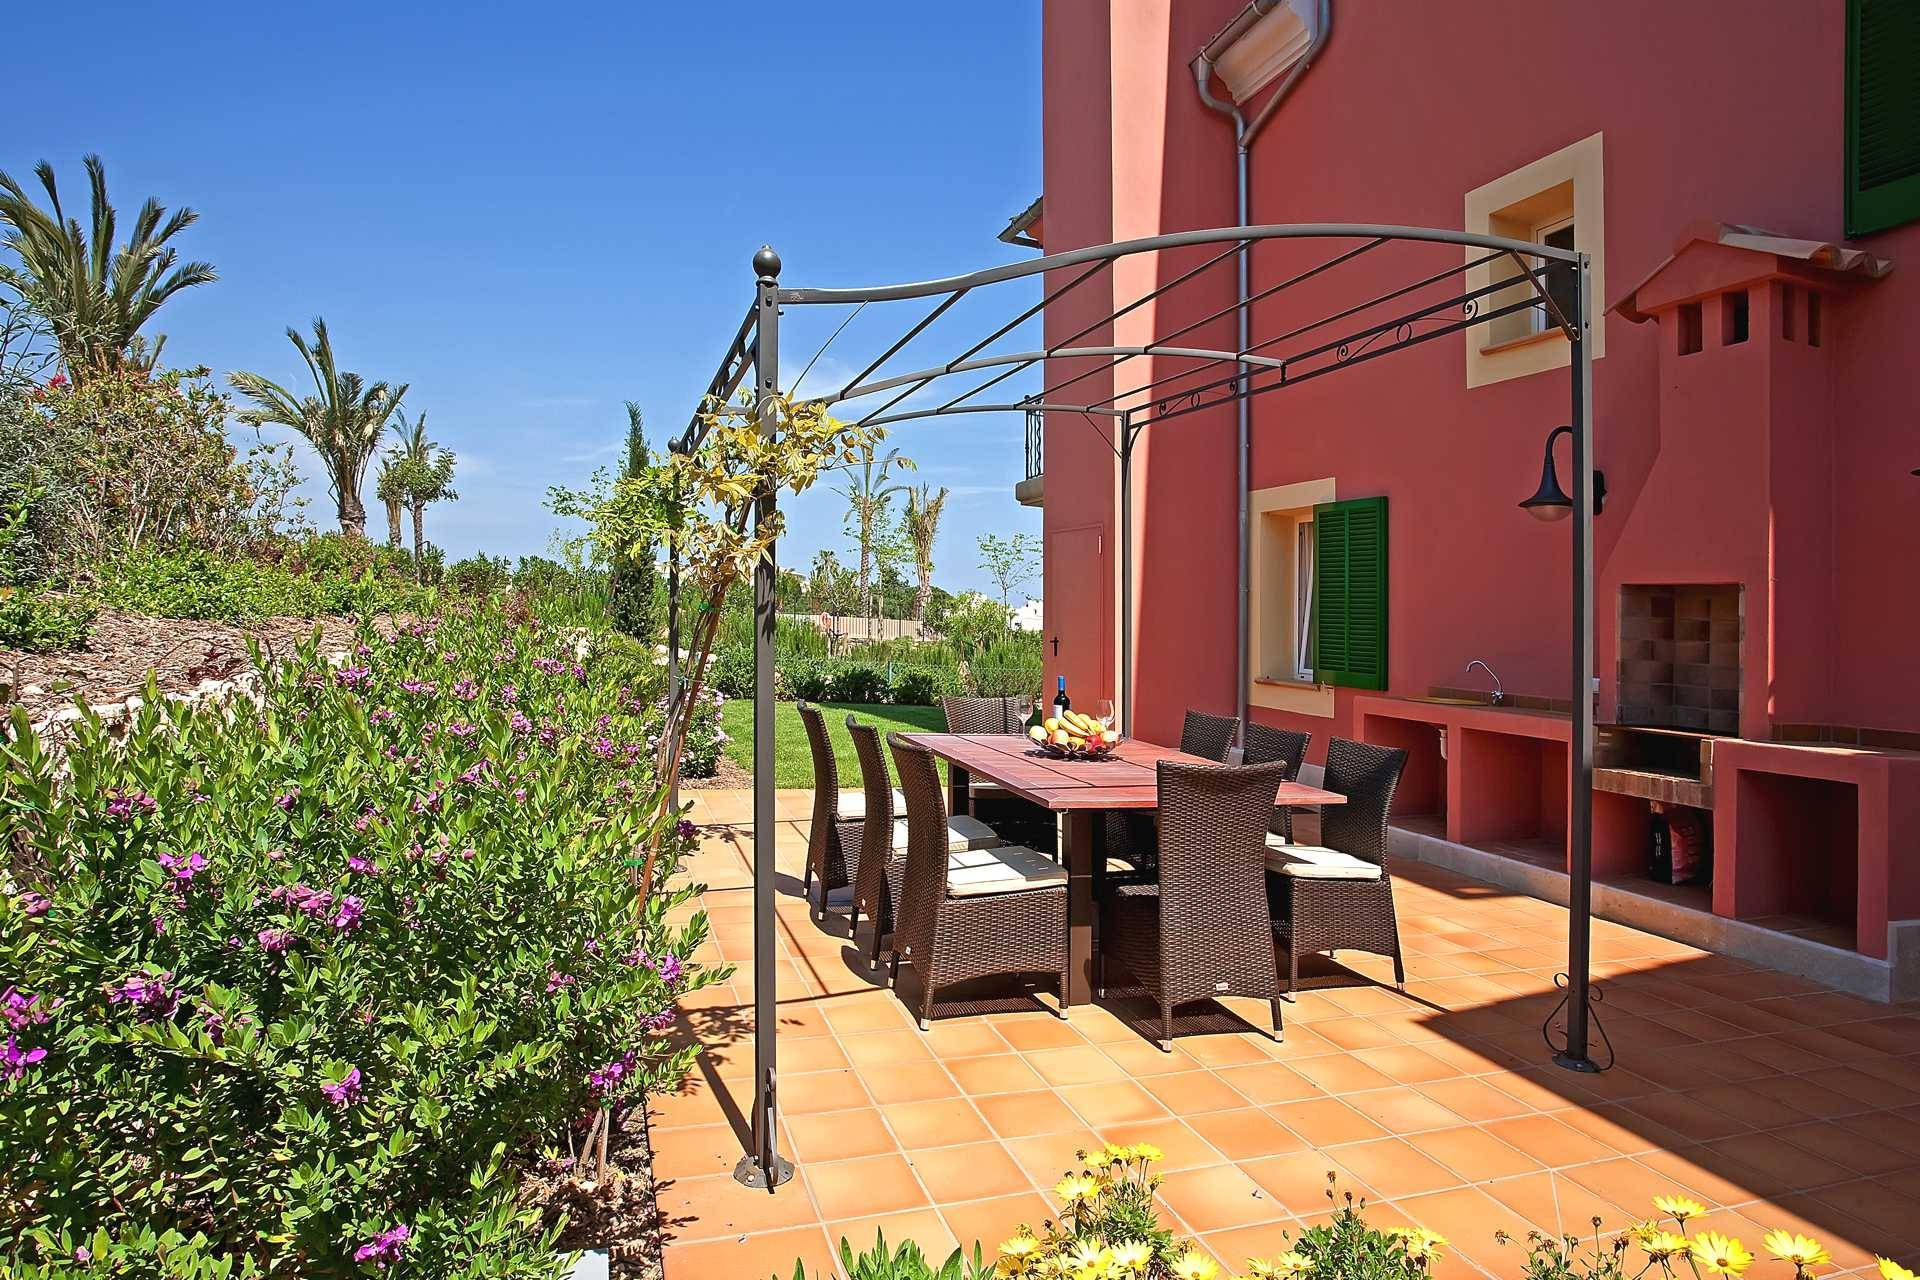 01-62 Modernes Ferienhaus Mallorca Osten Bild 3